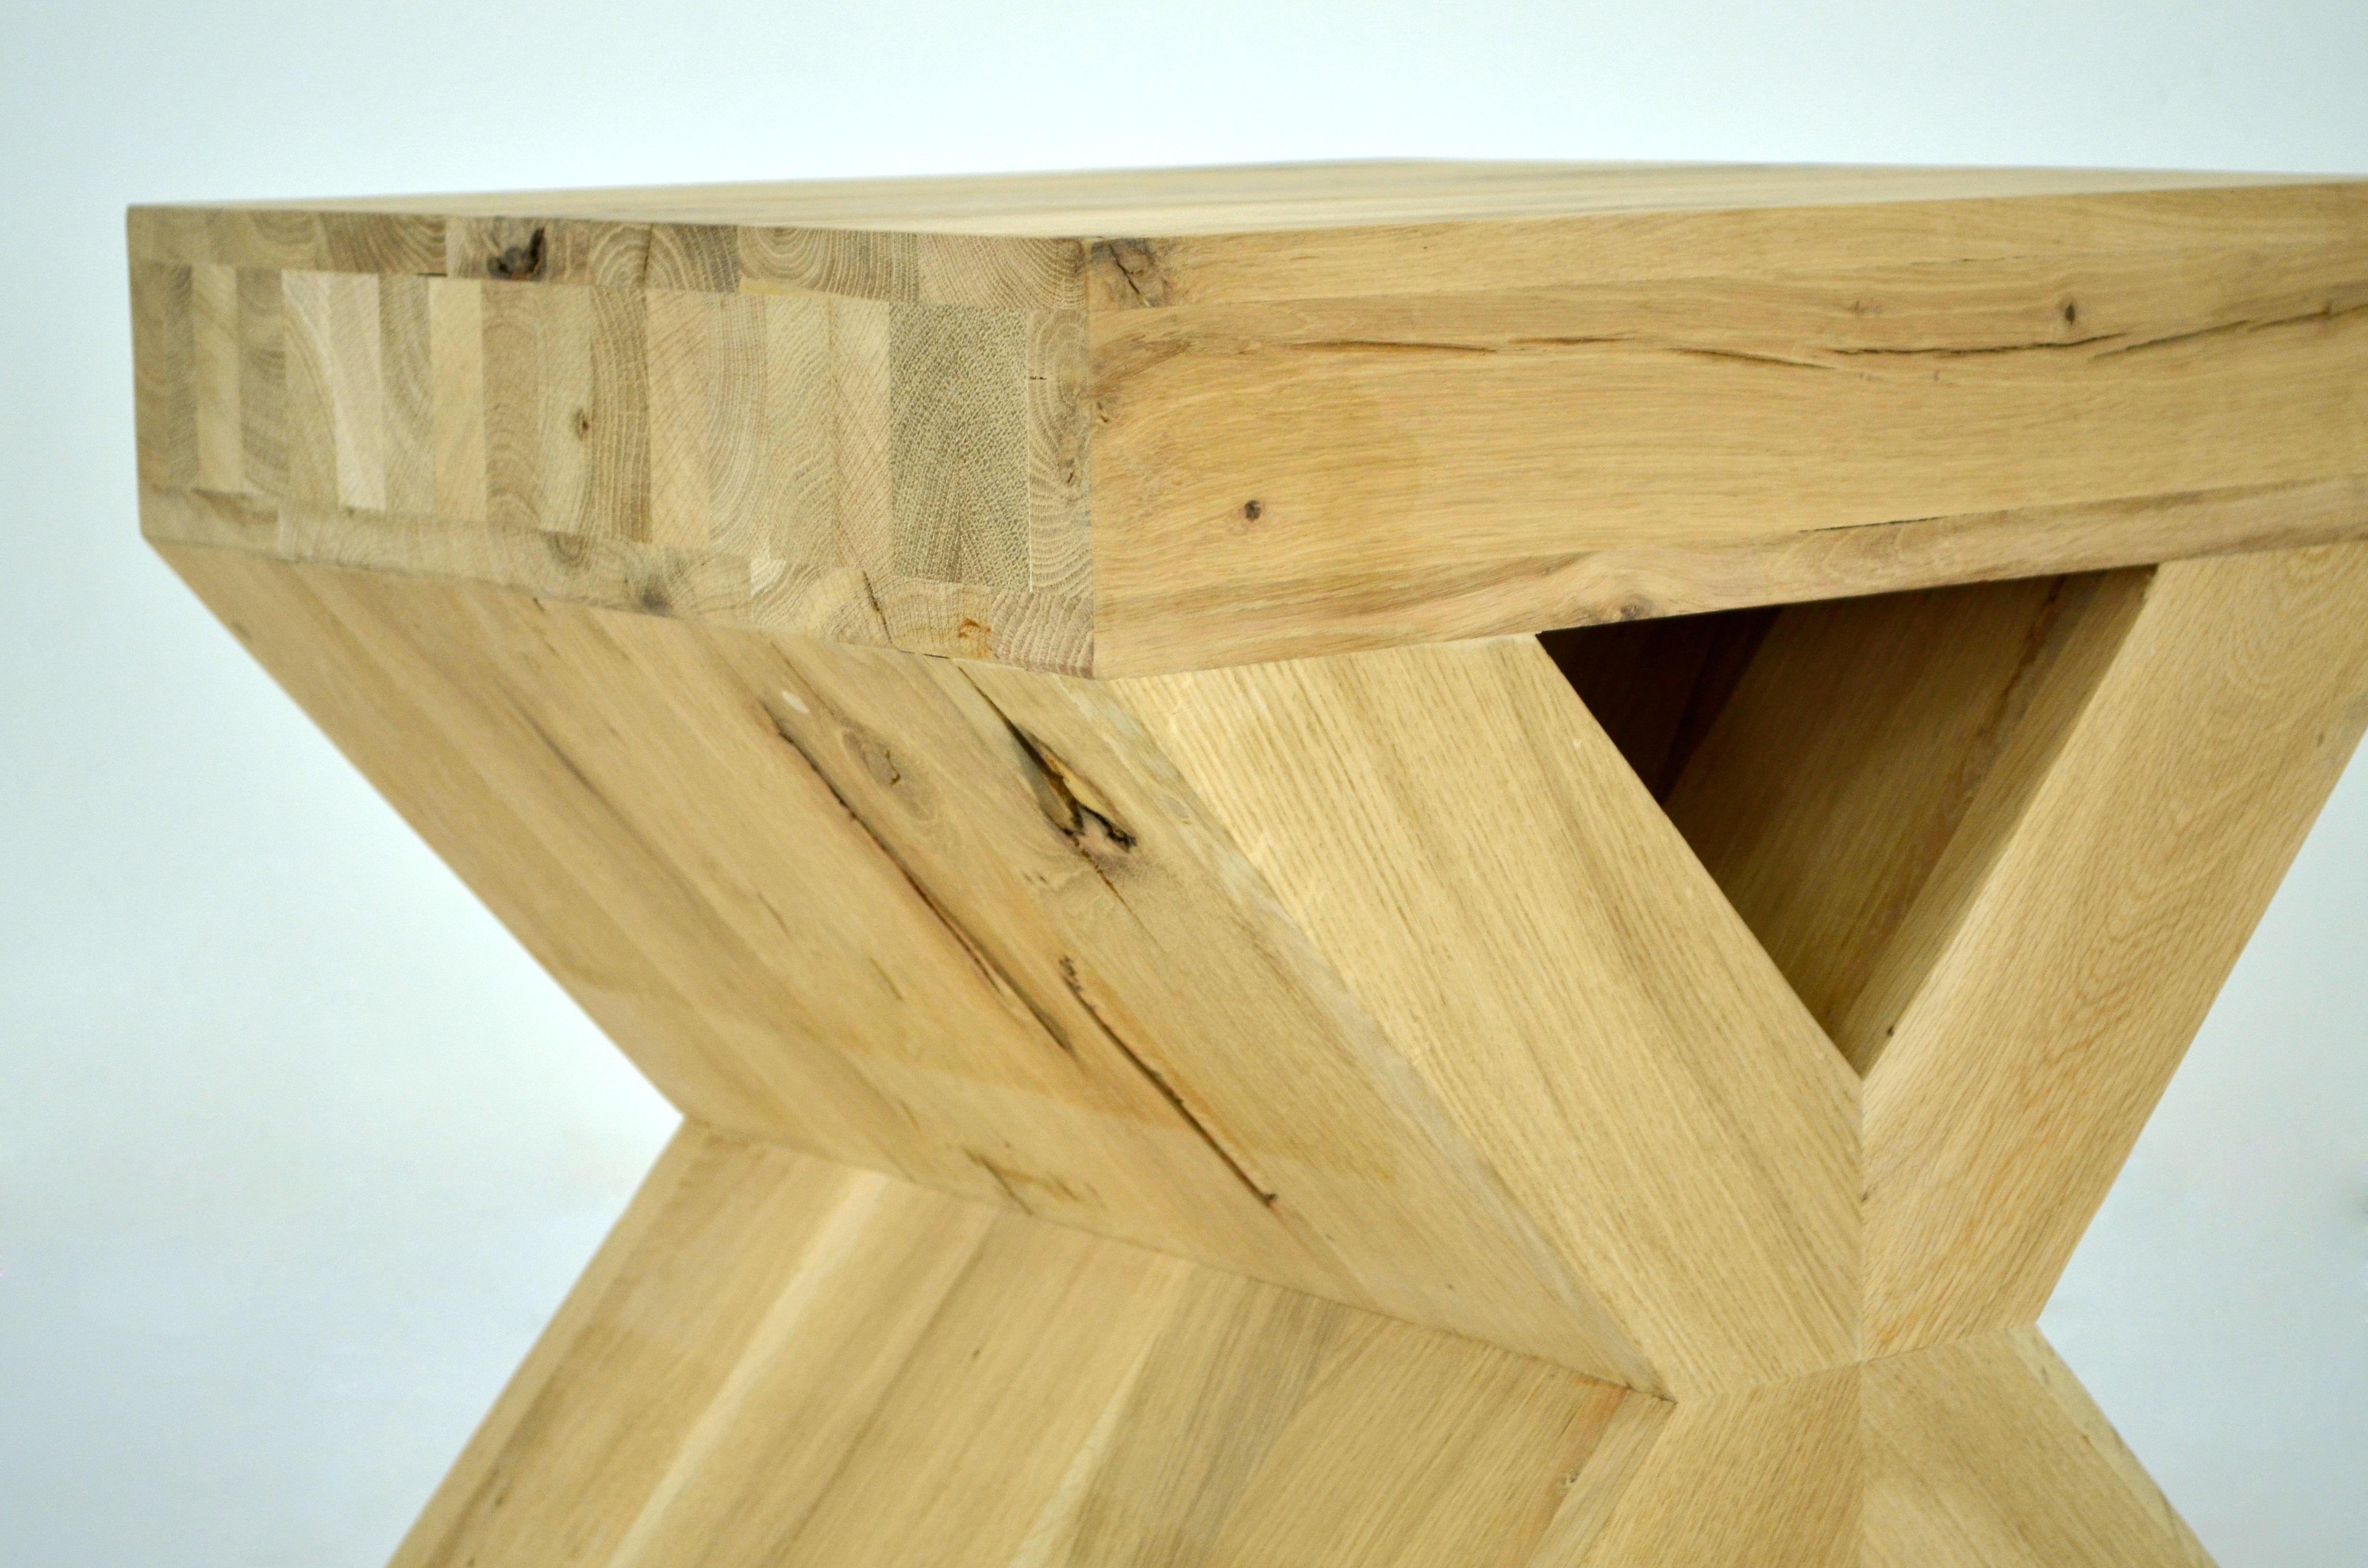 Fotos gratis : mesa, natural, pequeña, estante, mueble, cajón ...